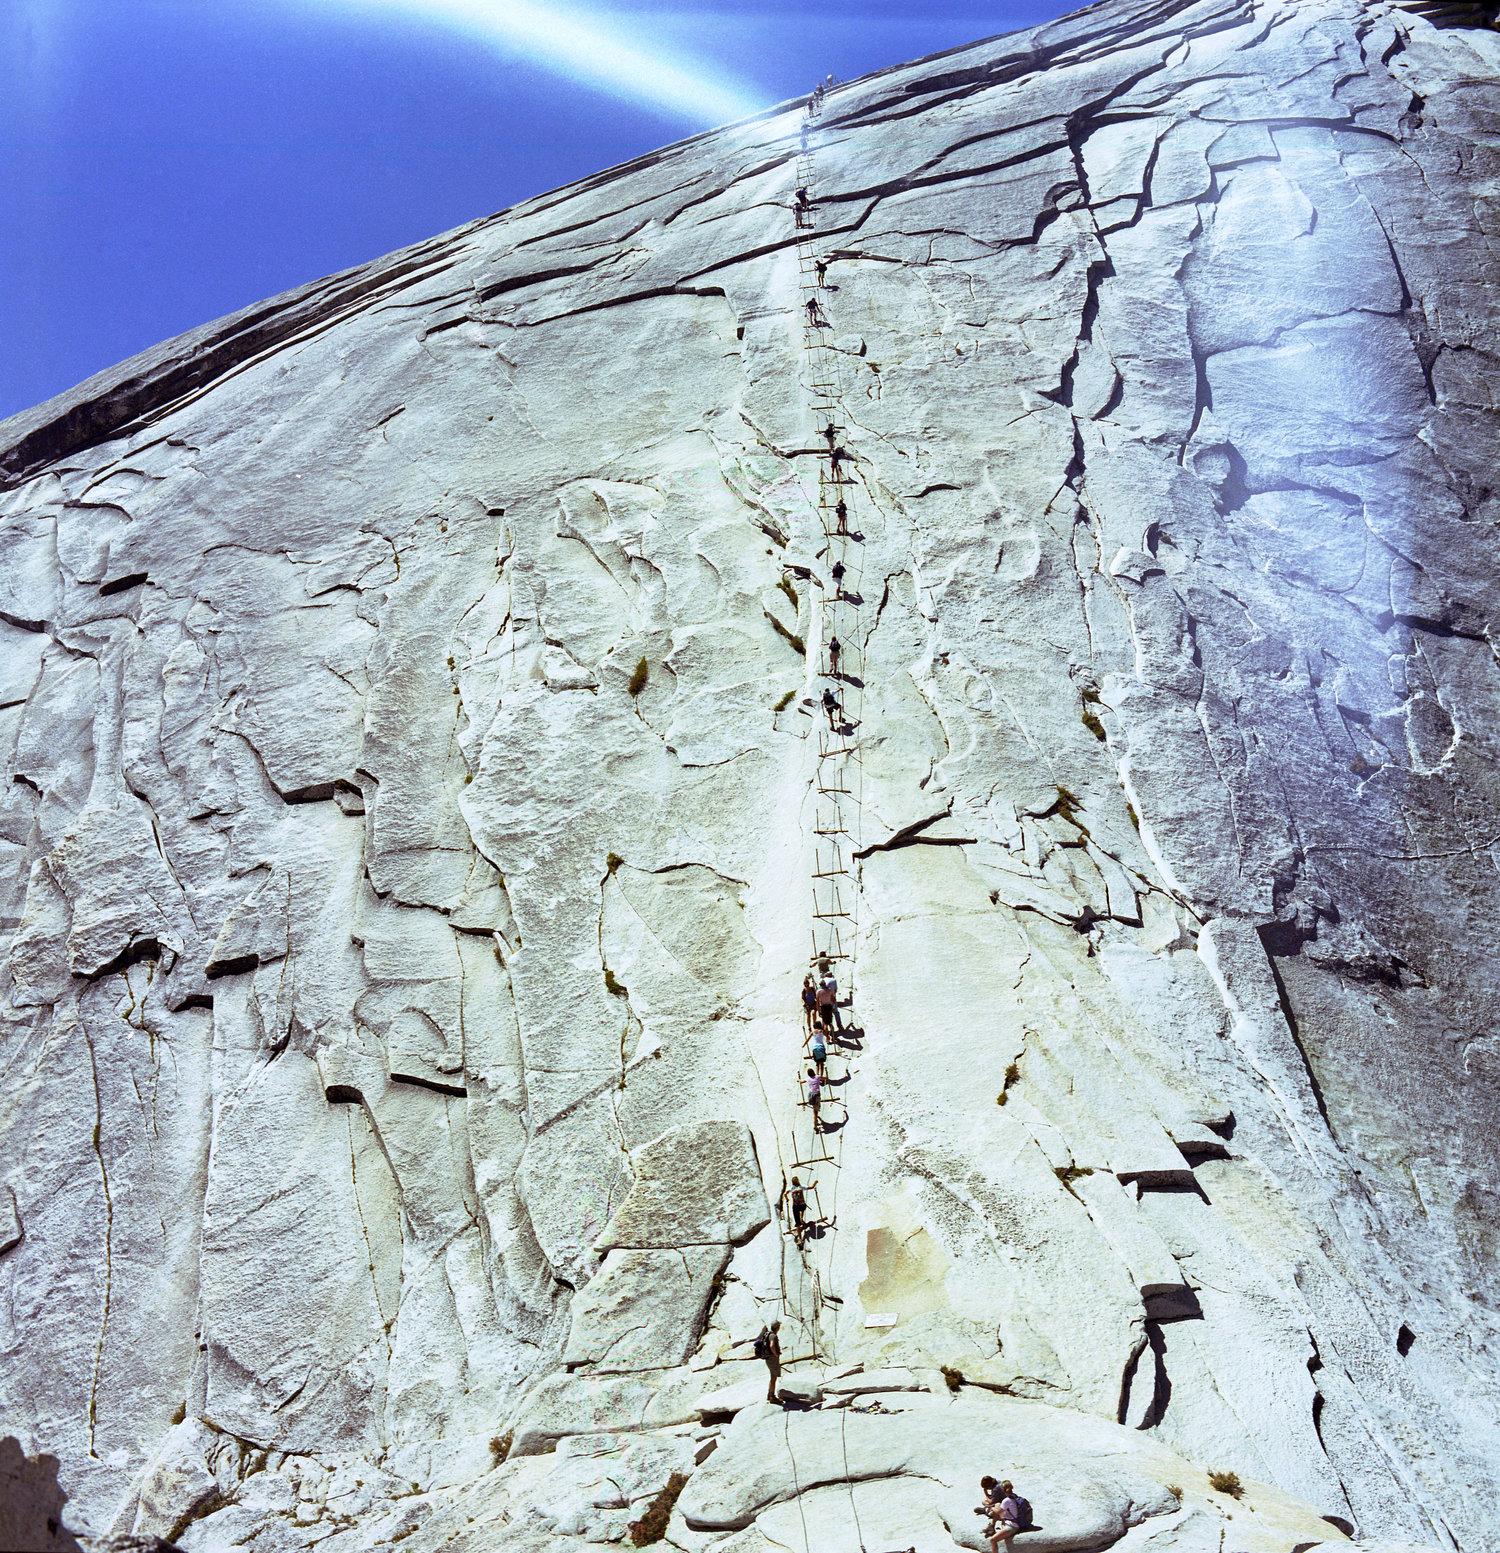 Half Dome, taken on my Medium Format Bronica Camera, 2008